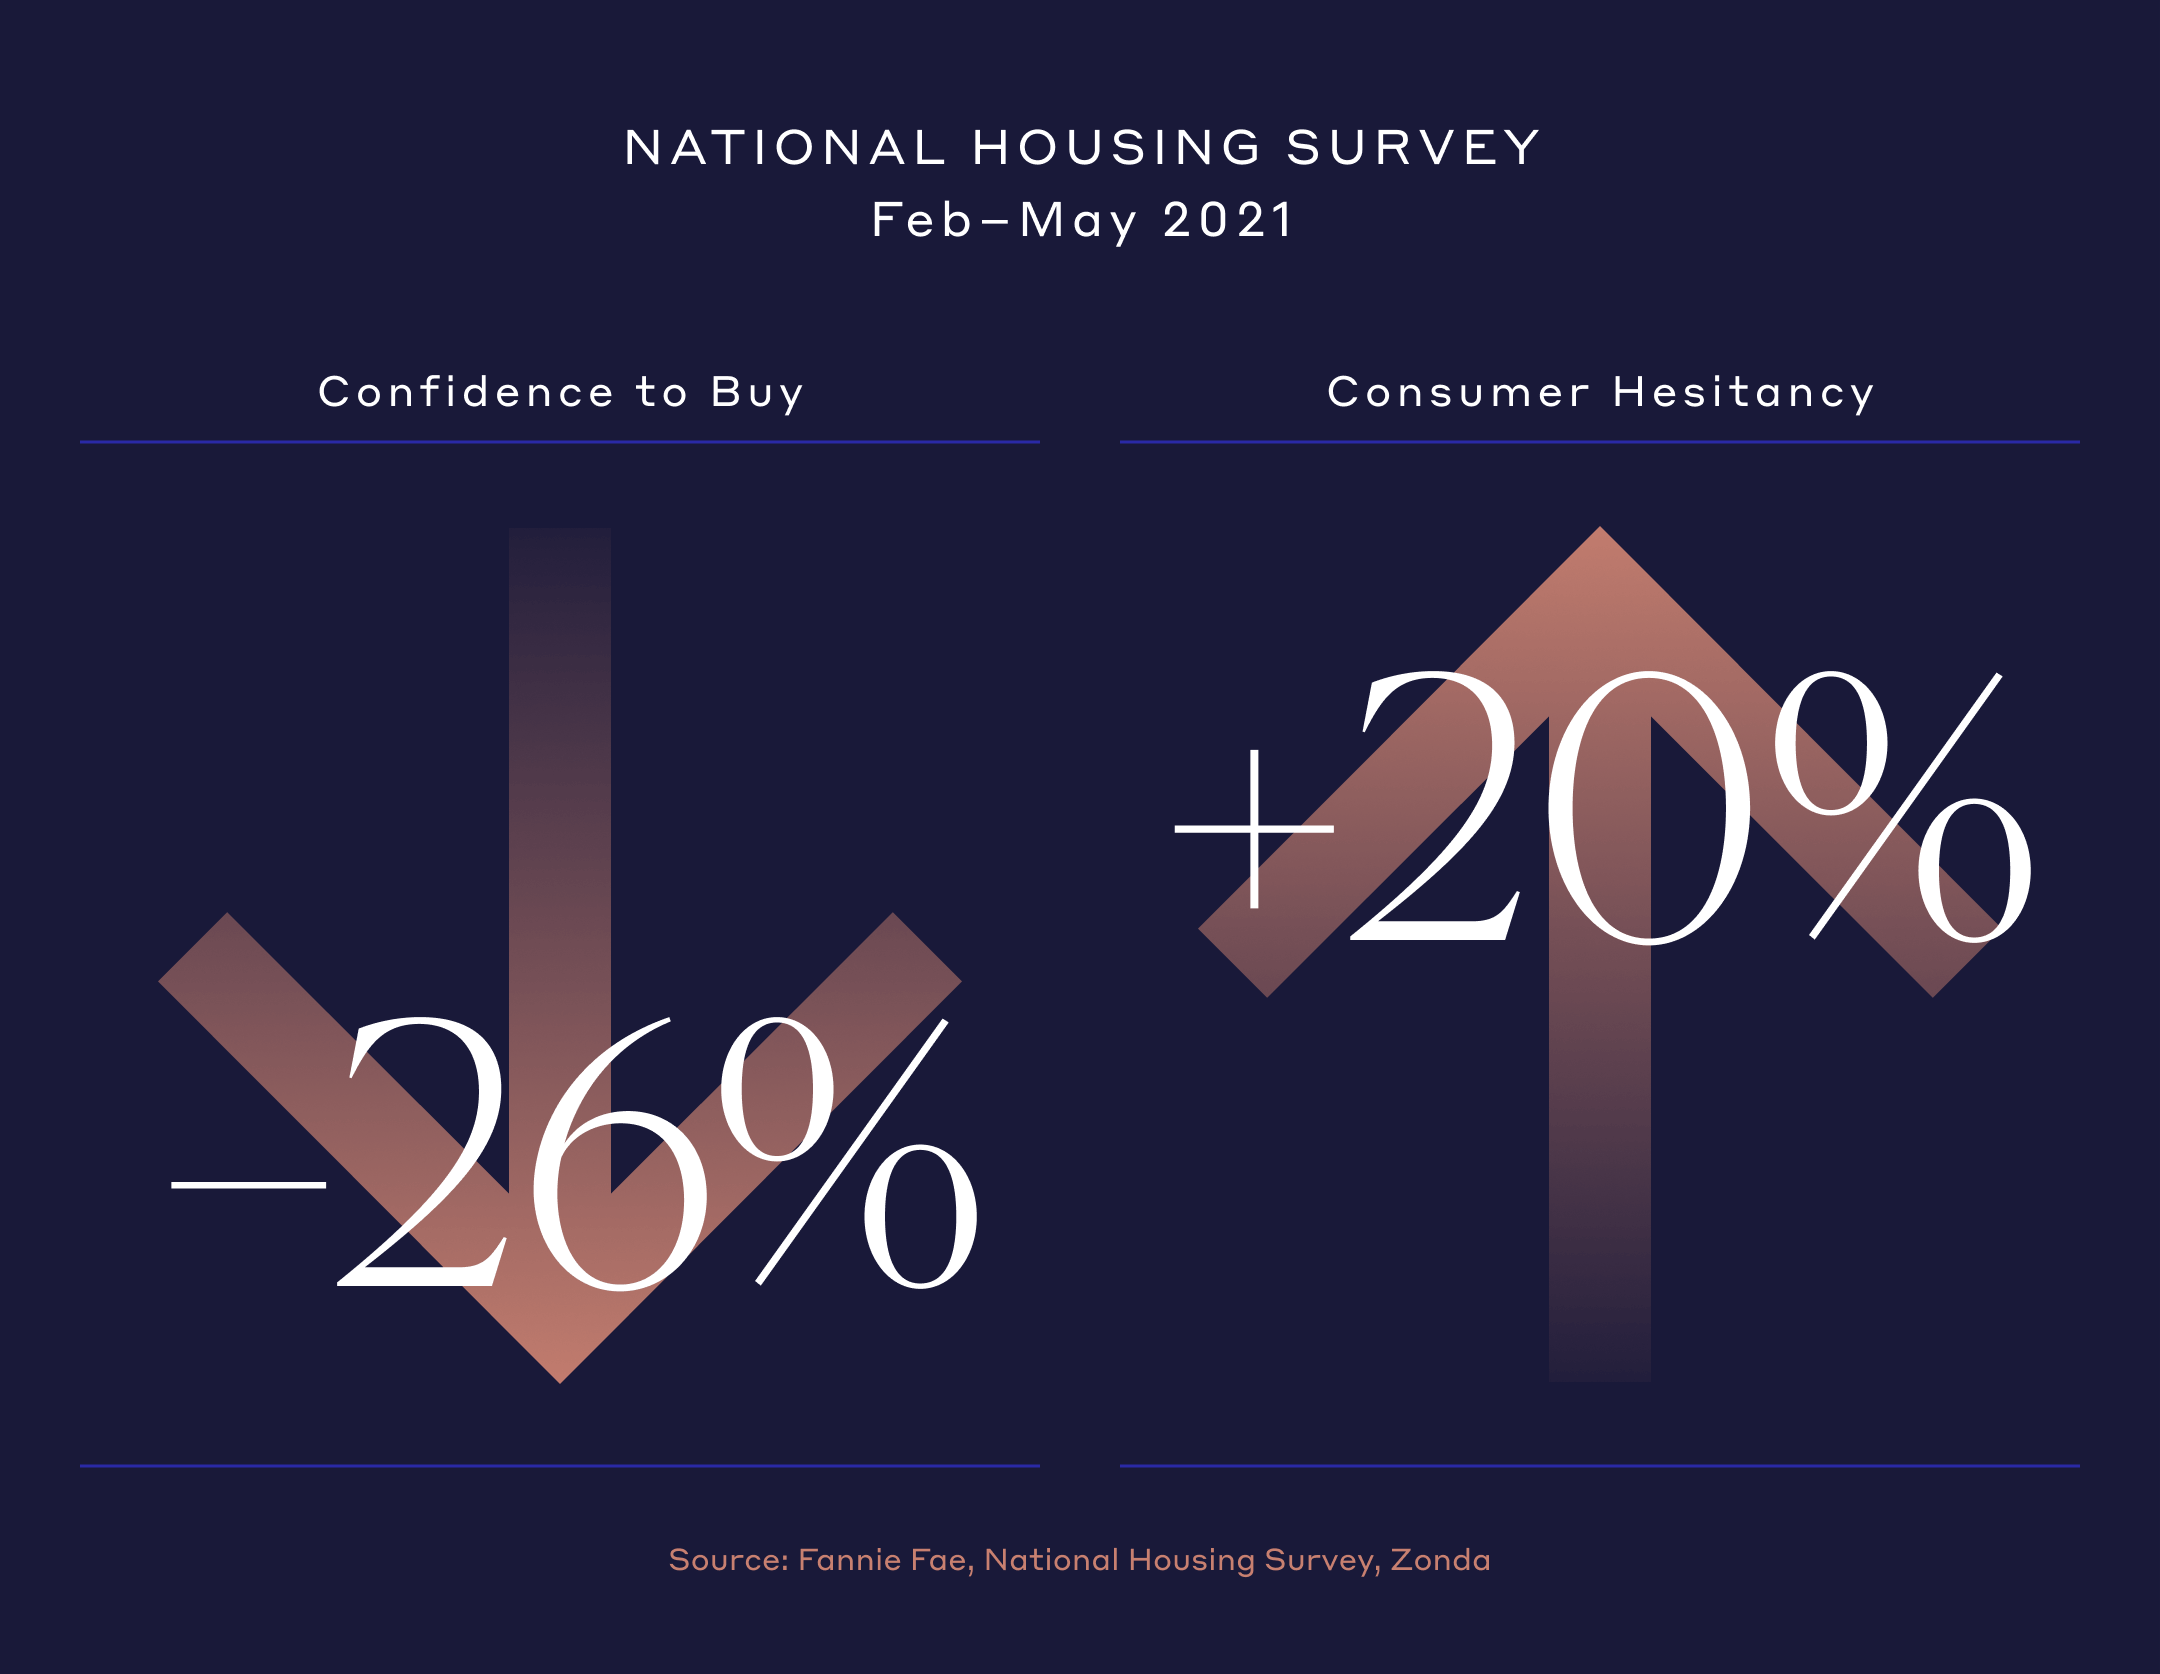 National Housing Survey